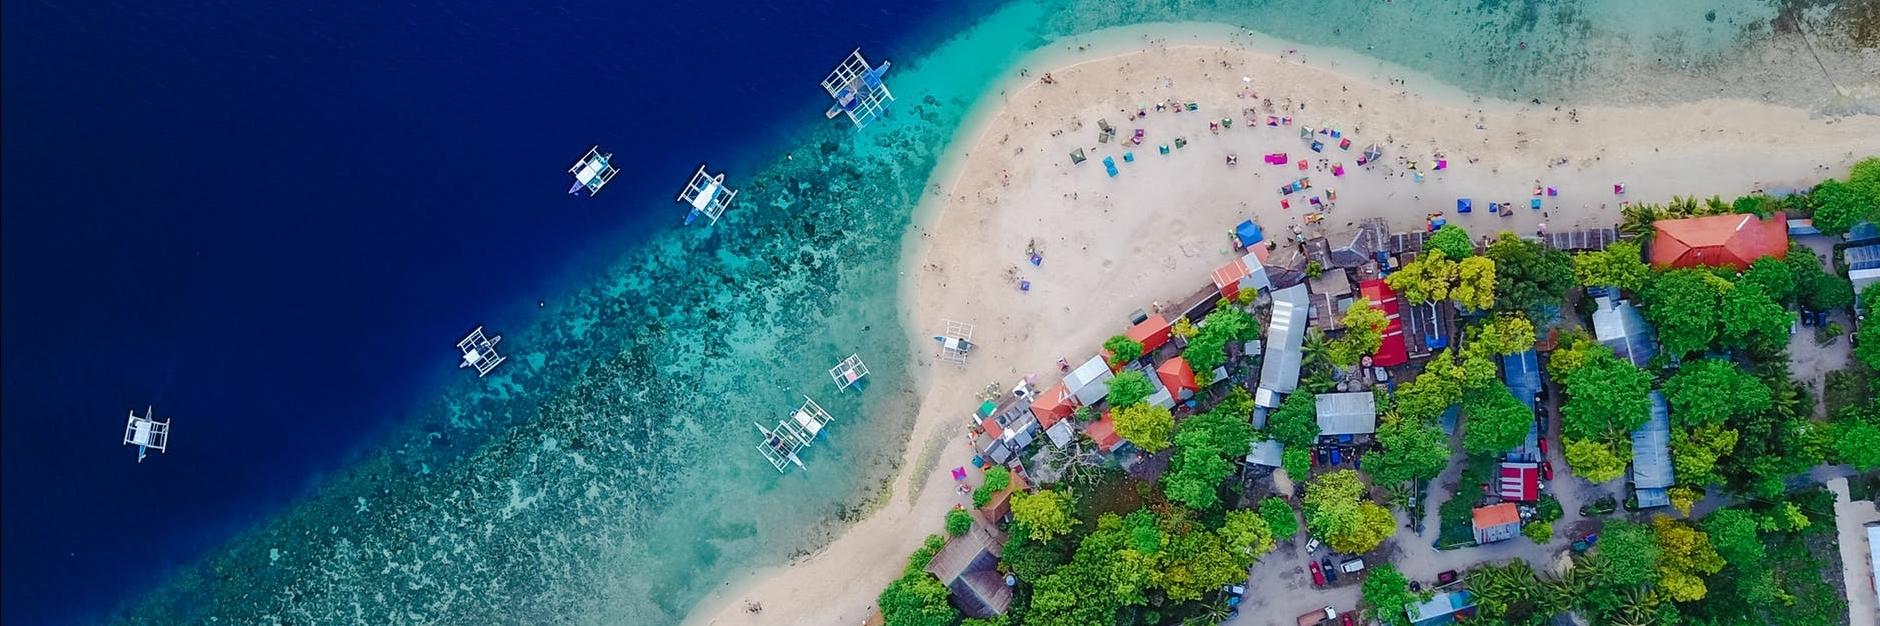 https://gody.vn/blog/araara0211909209/post/kham-pha-cebu-4n4d-thien-duong-bien-tuyet-dep-chang-lo-thieu-cho-an-cho-ngu-tai-philippines-5423